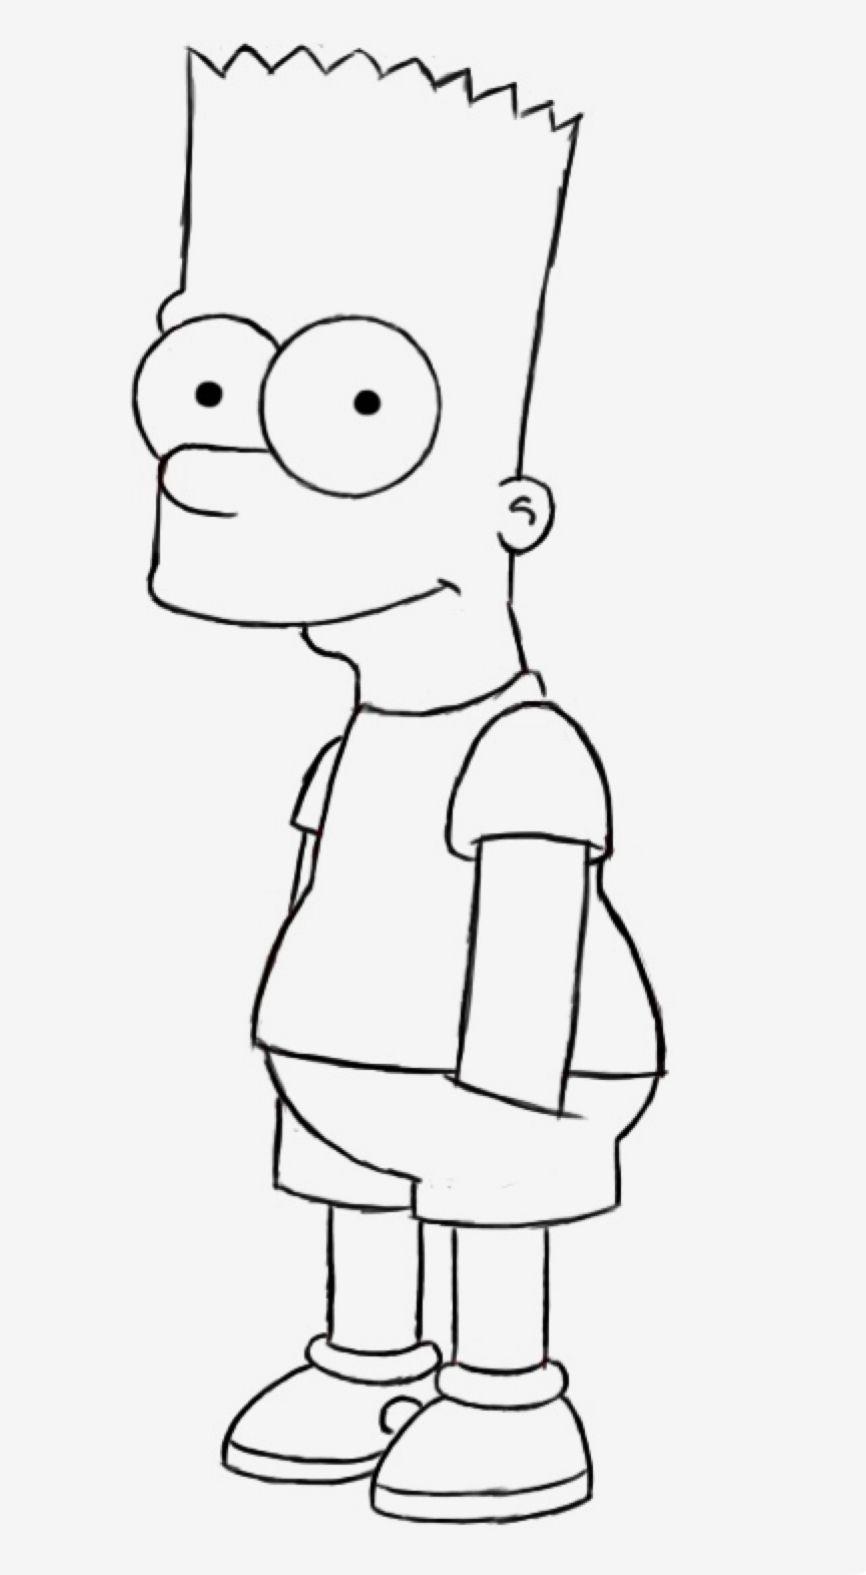 Pin By Patricia On иллюстрации чернилами Simpsons Art Simpsons Drawings Spongebob Drawings